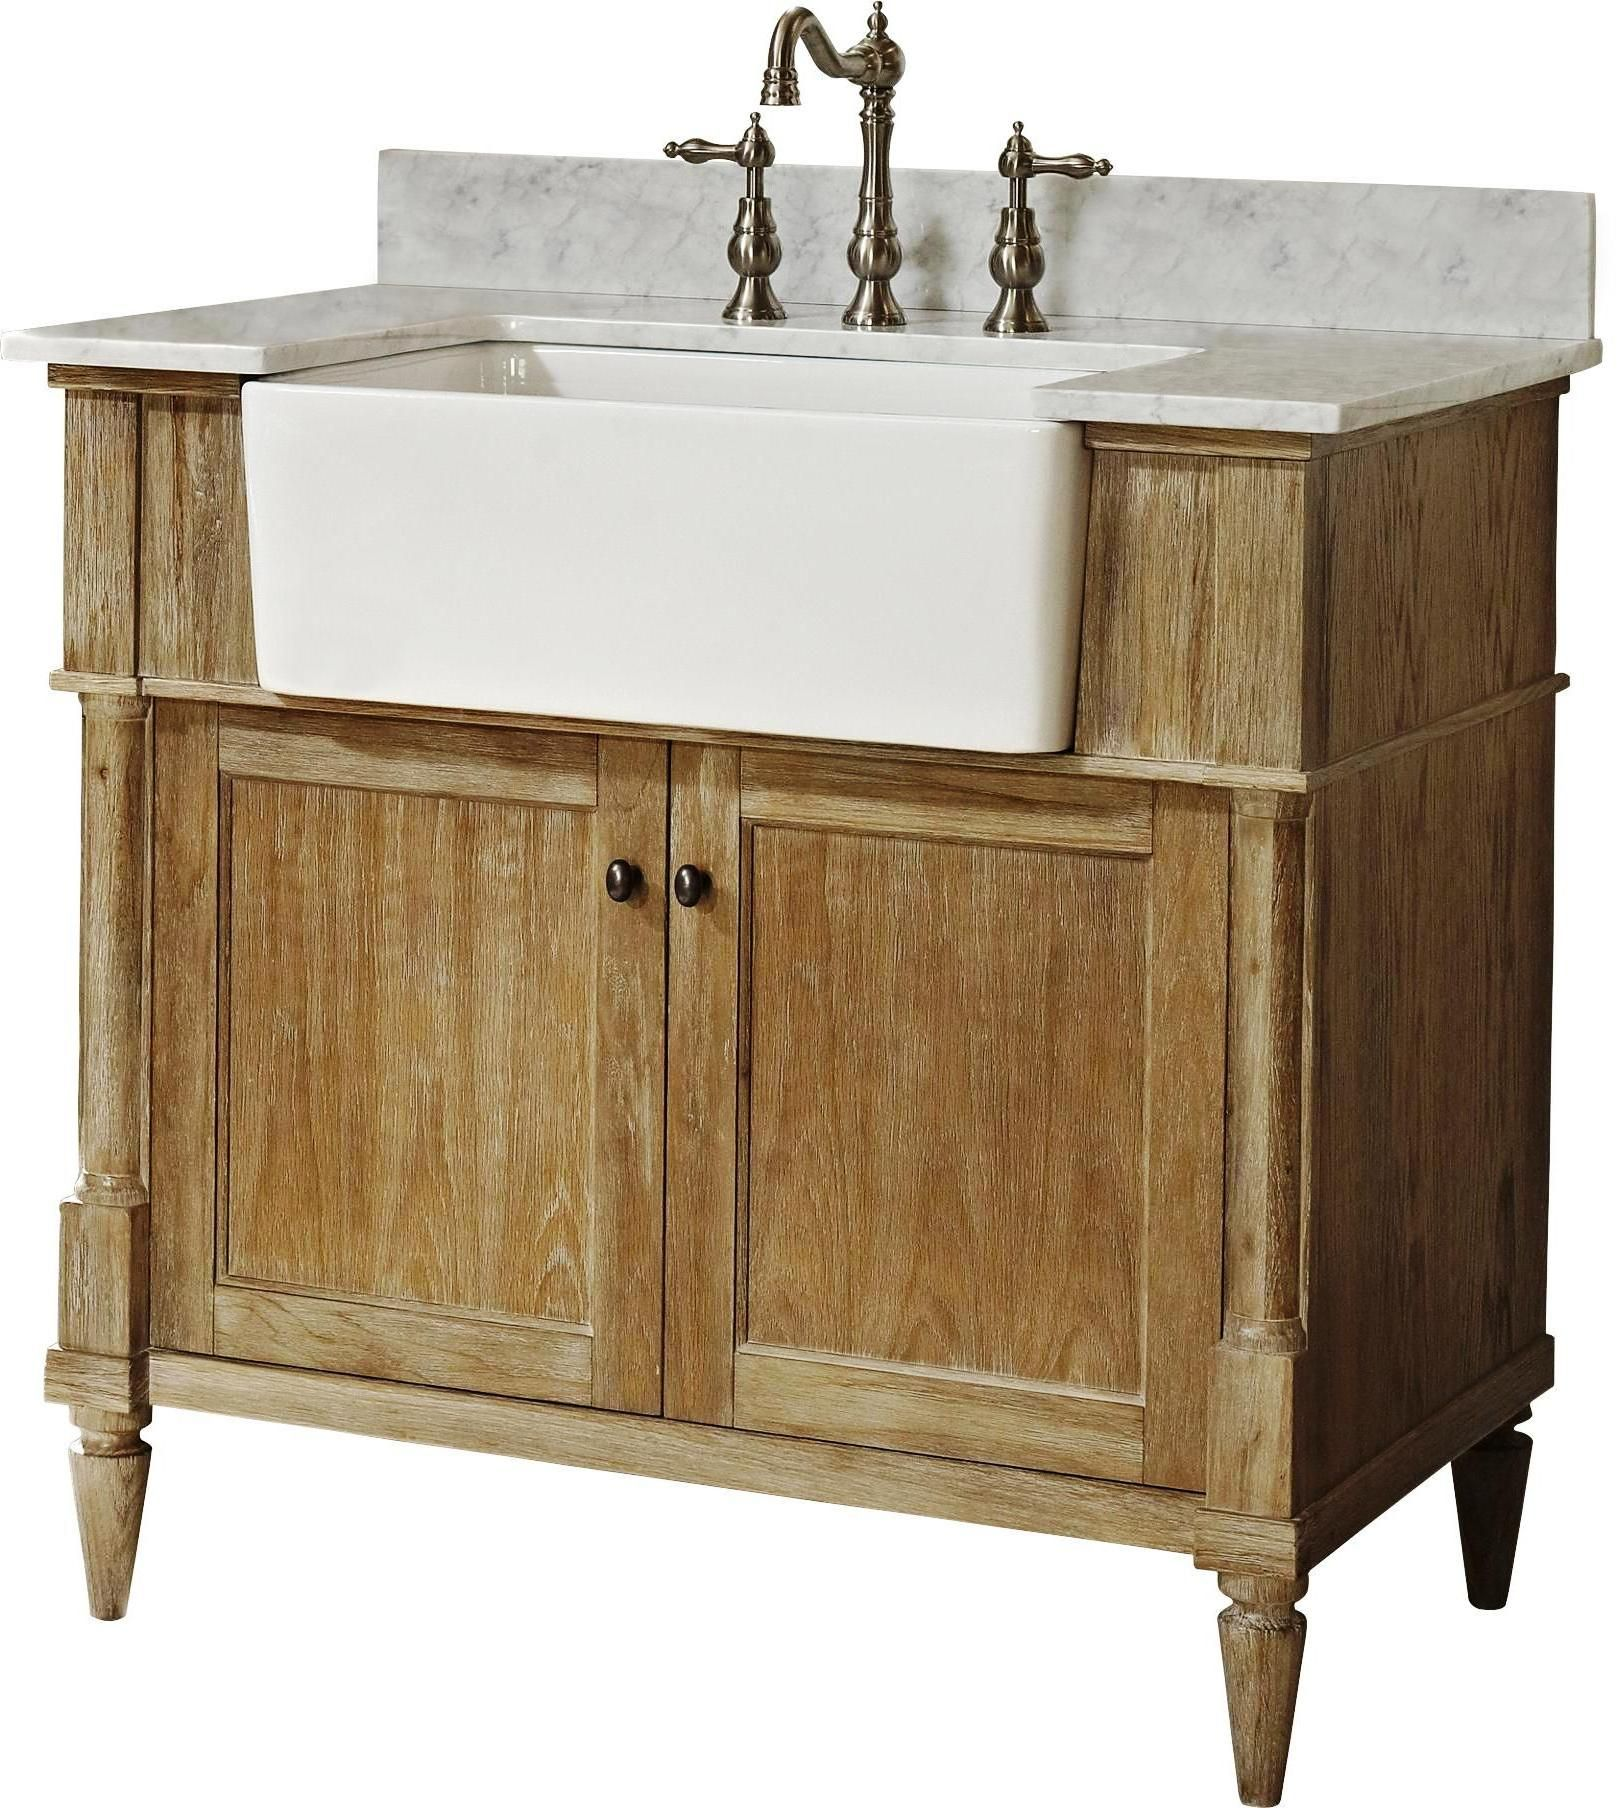 Reclaimed Barn Wood Open Vanity Rustic Bathrooms Bathroom